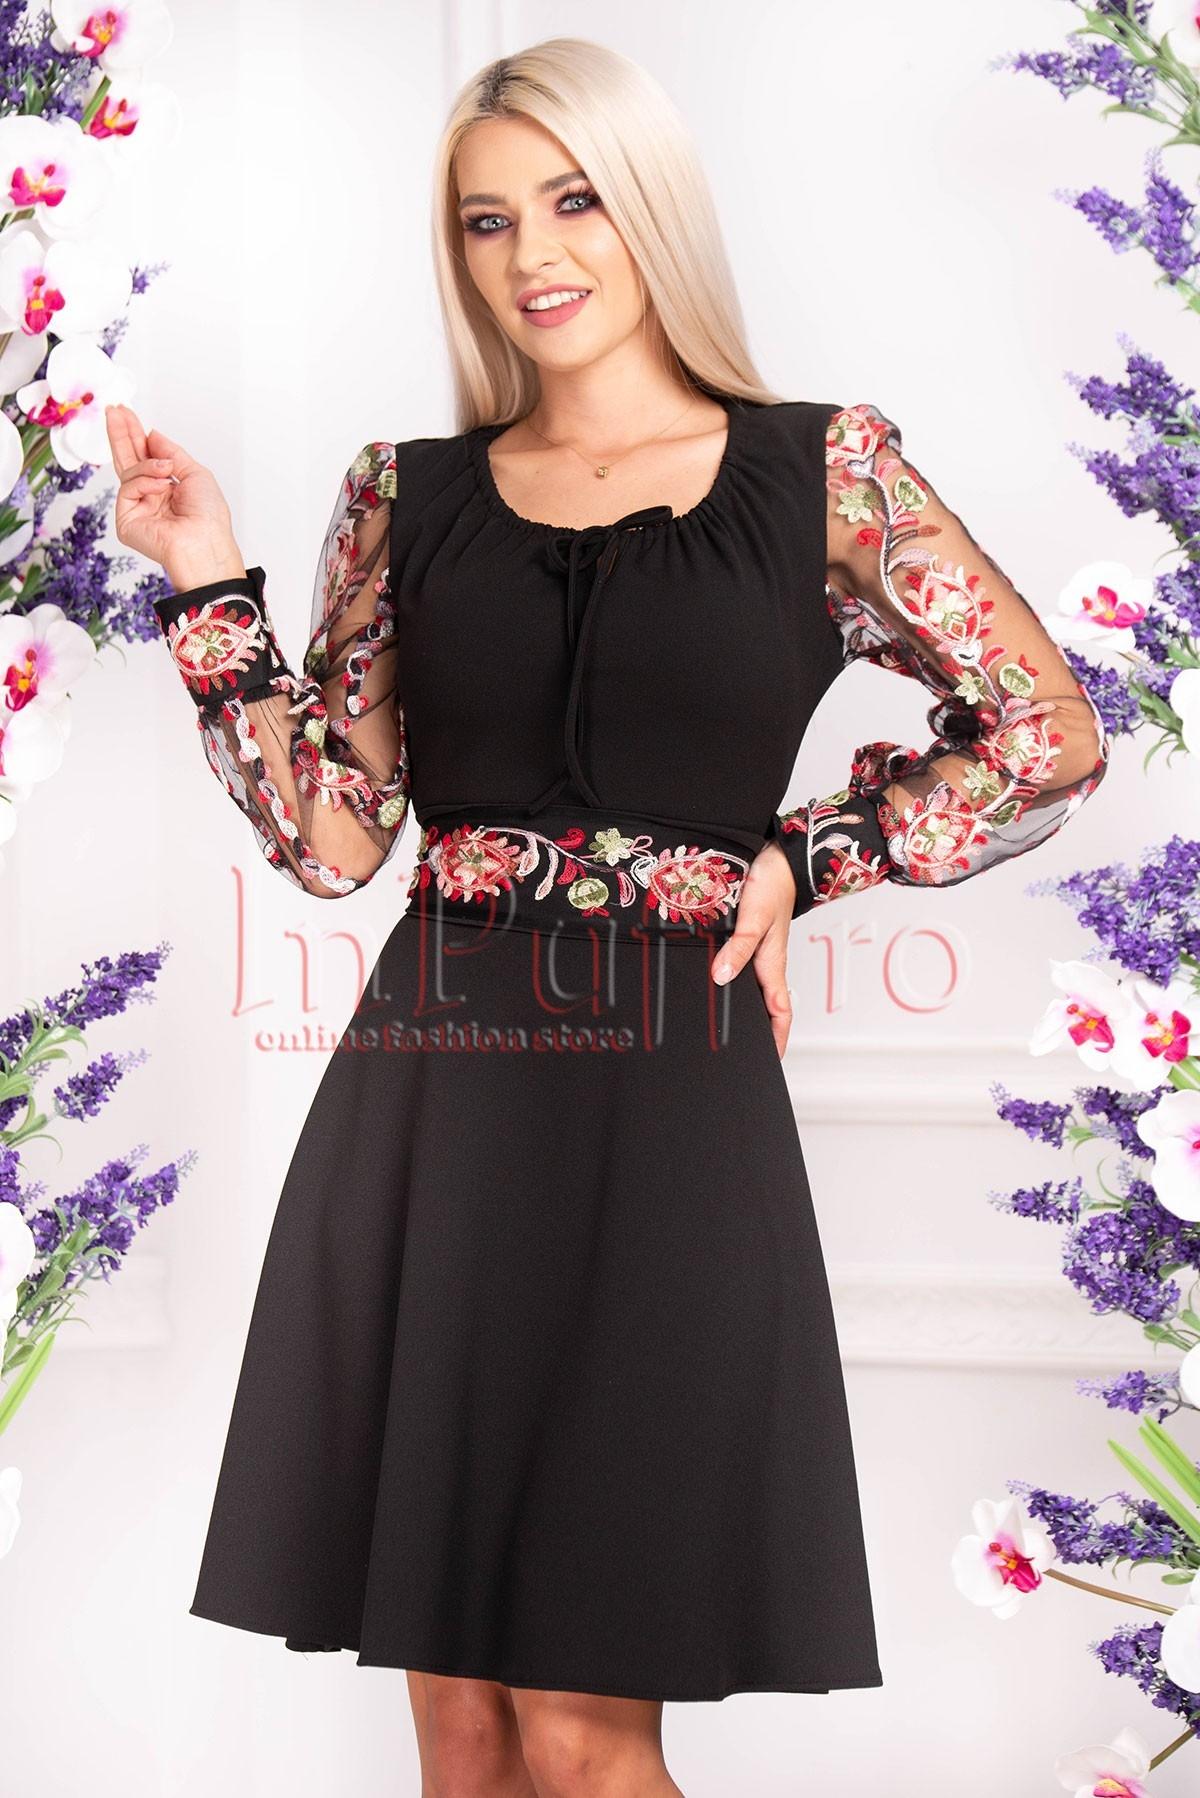 Rochie neagra cu broderie multicolora